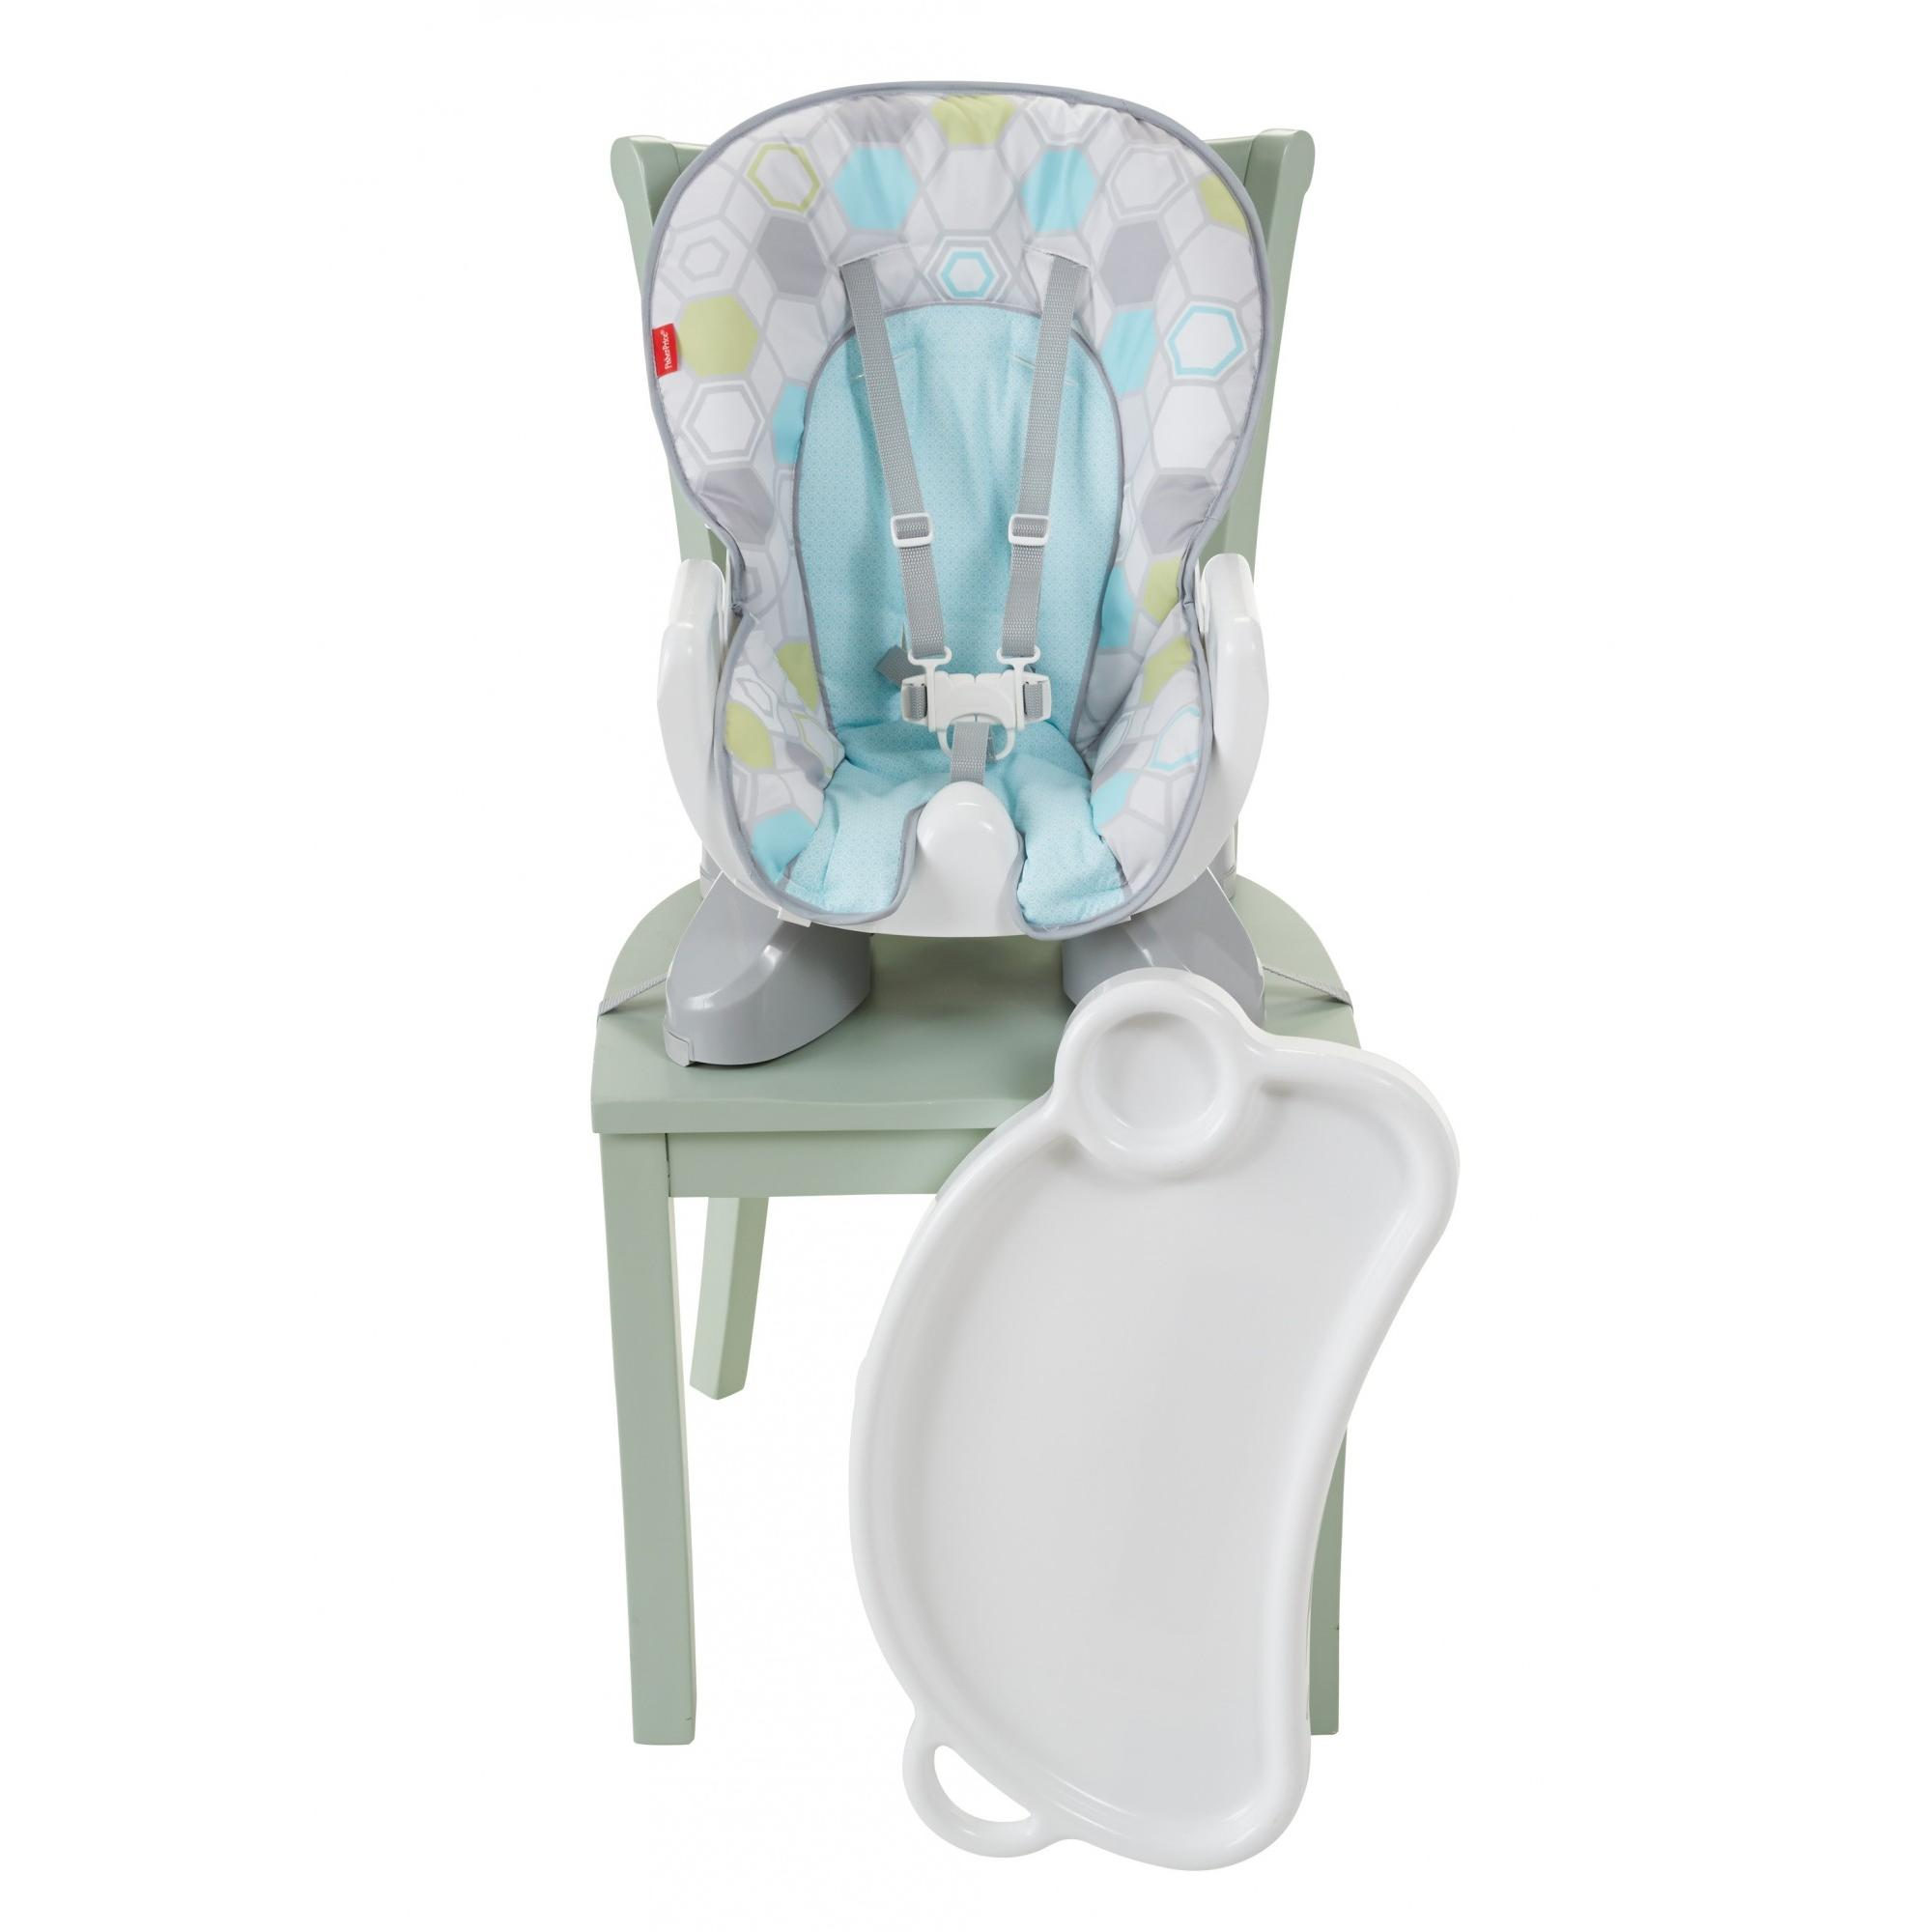 Fisher Price Space Saver High Chair Walmart